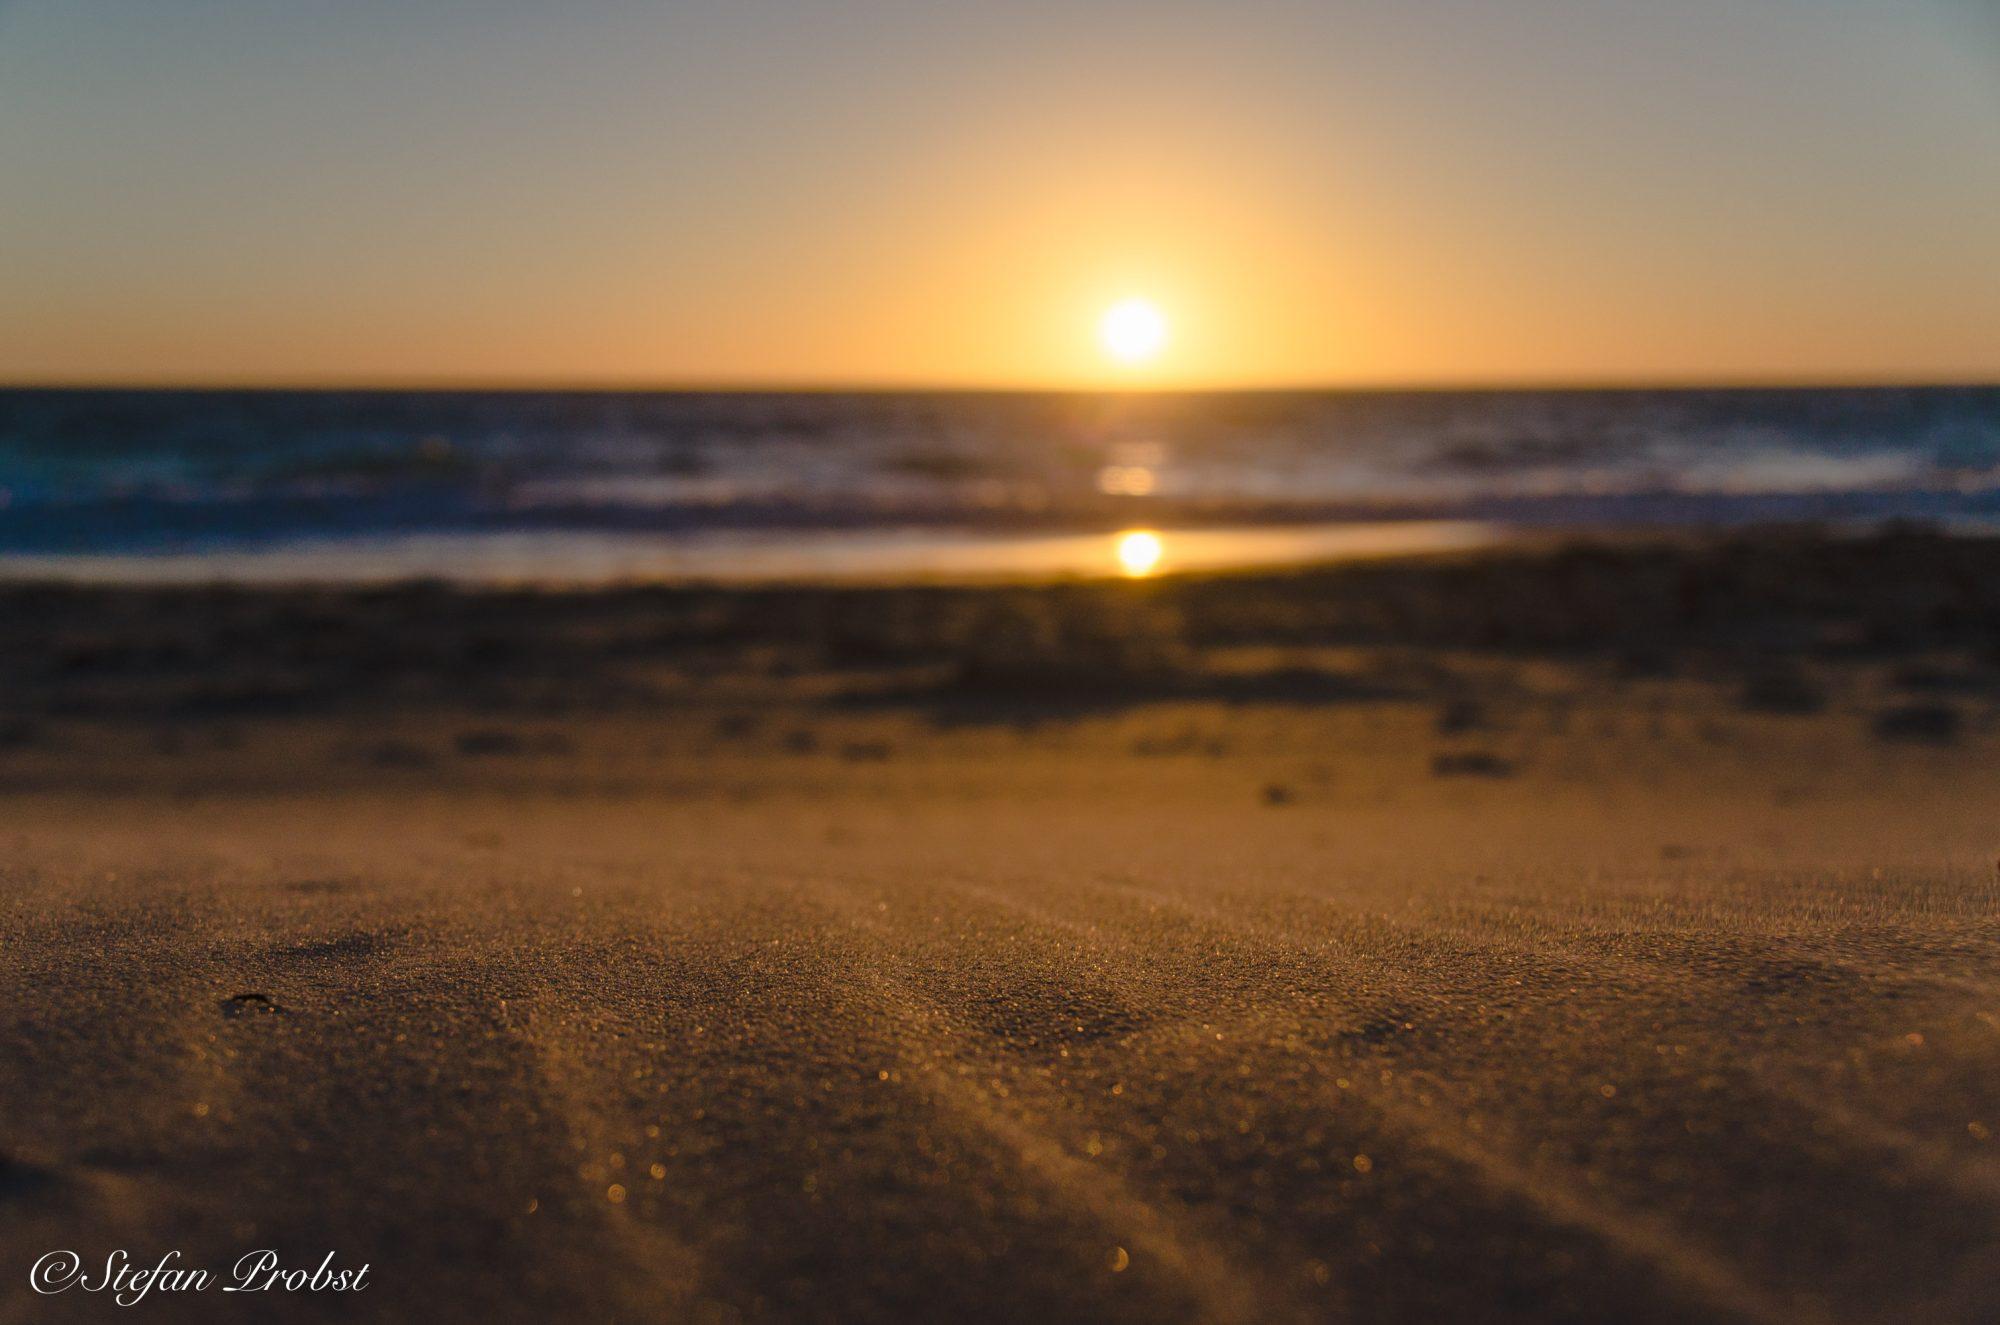 Wellen im Sand bei Sonnenuntergang